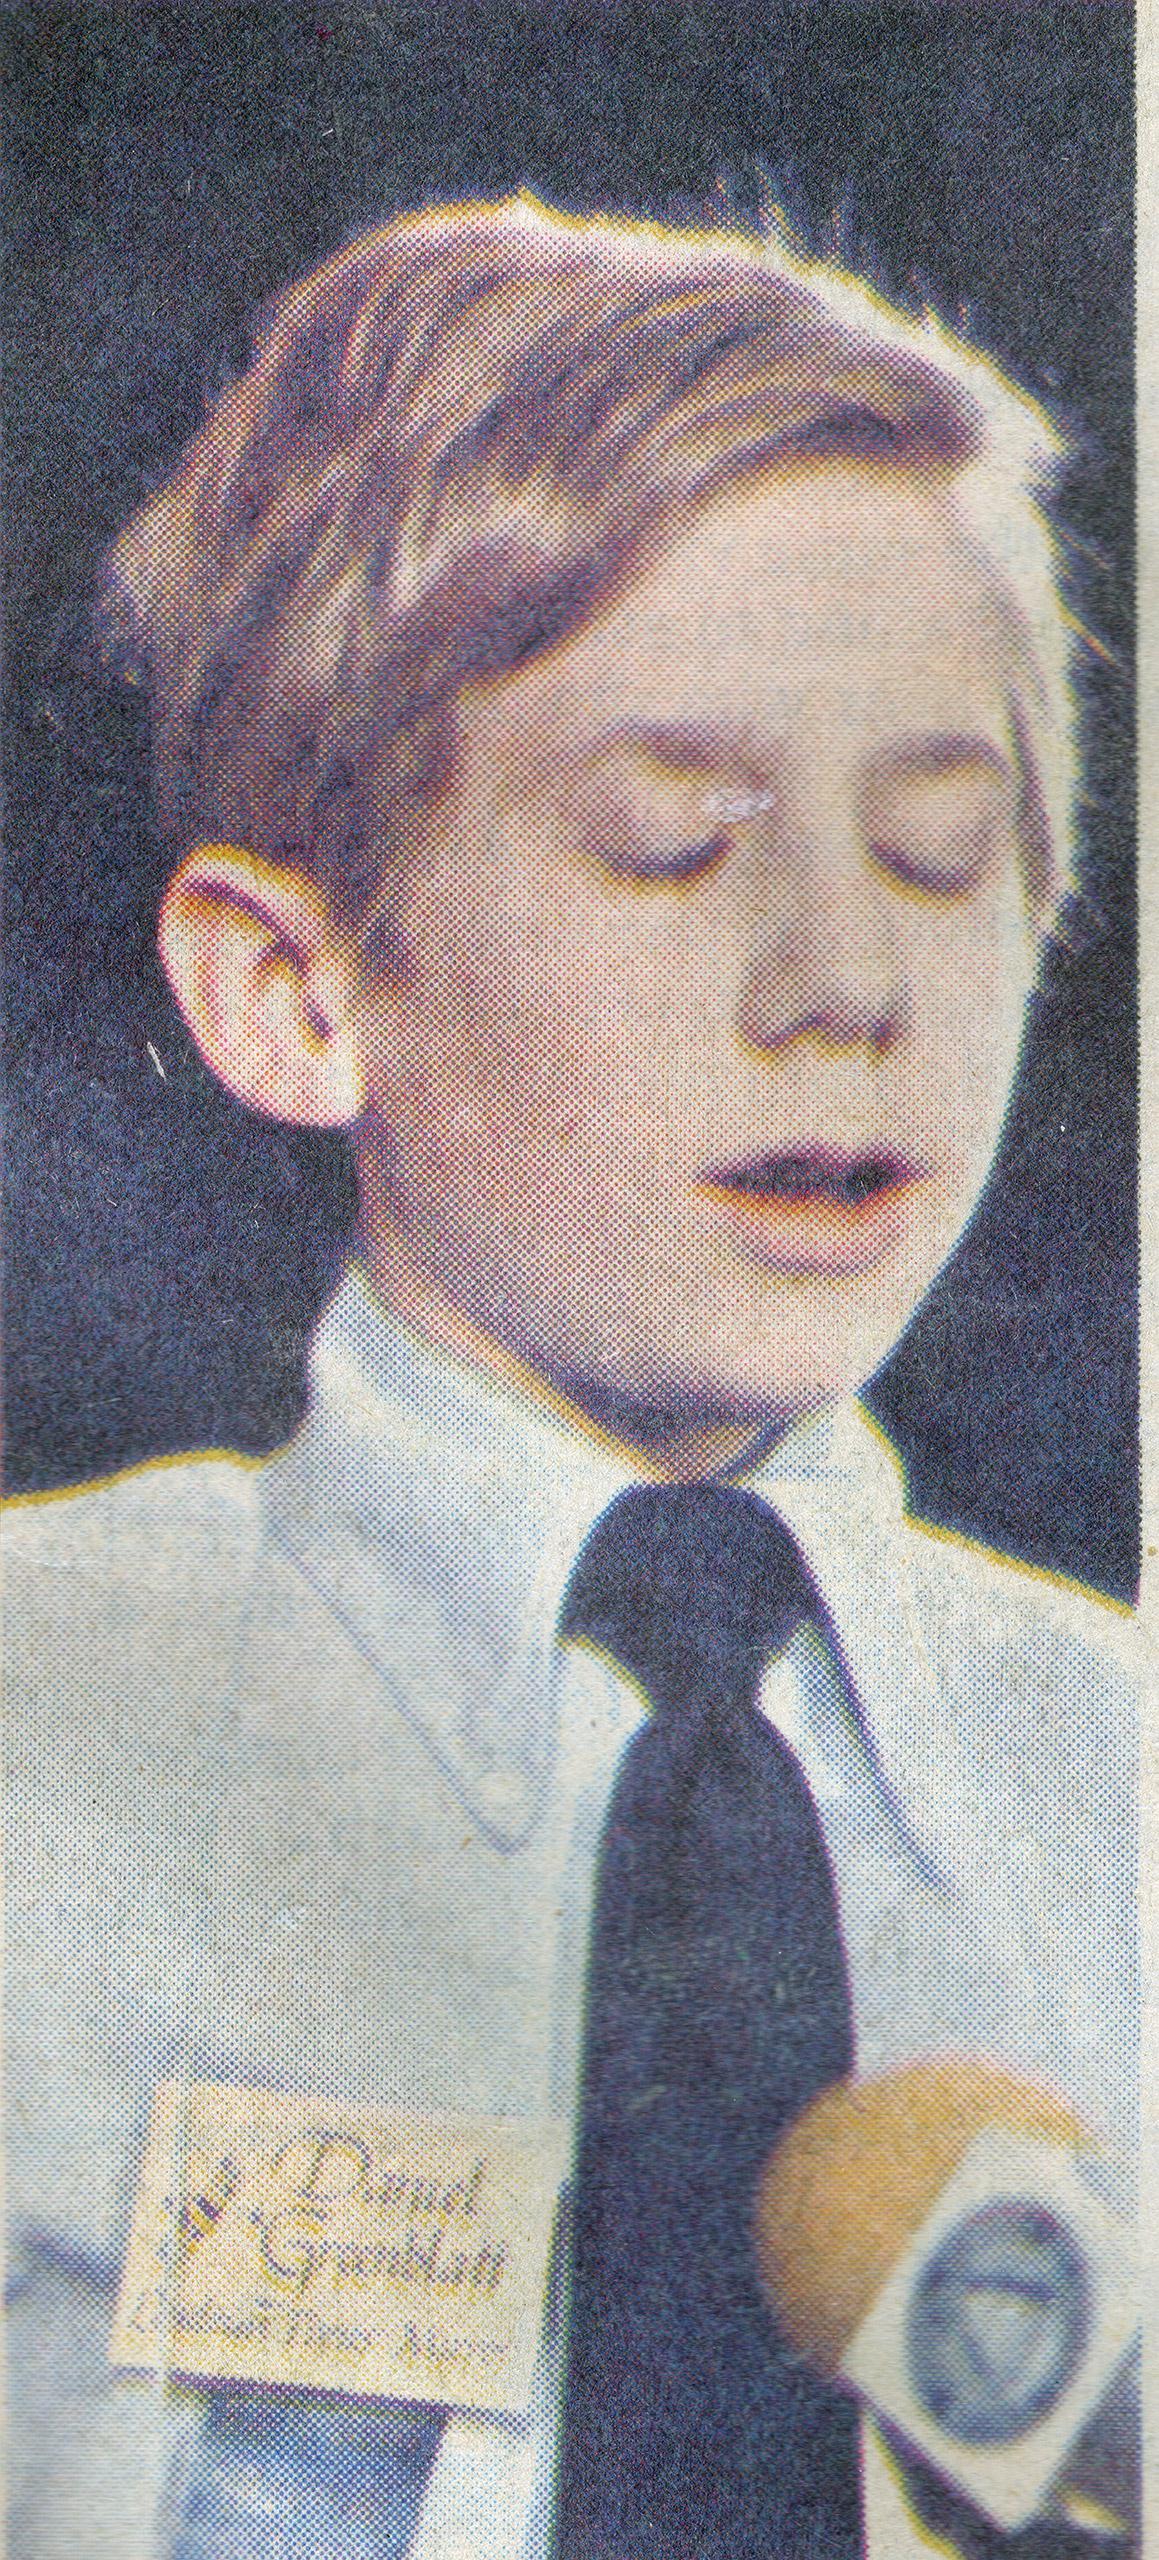 1984 Scripps National Spelling Bee champion Daniel Greenblatt.